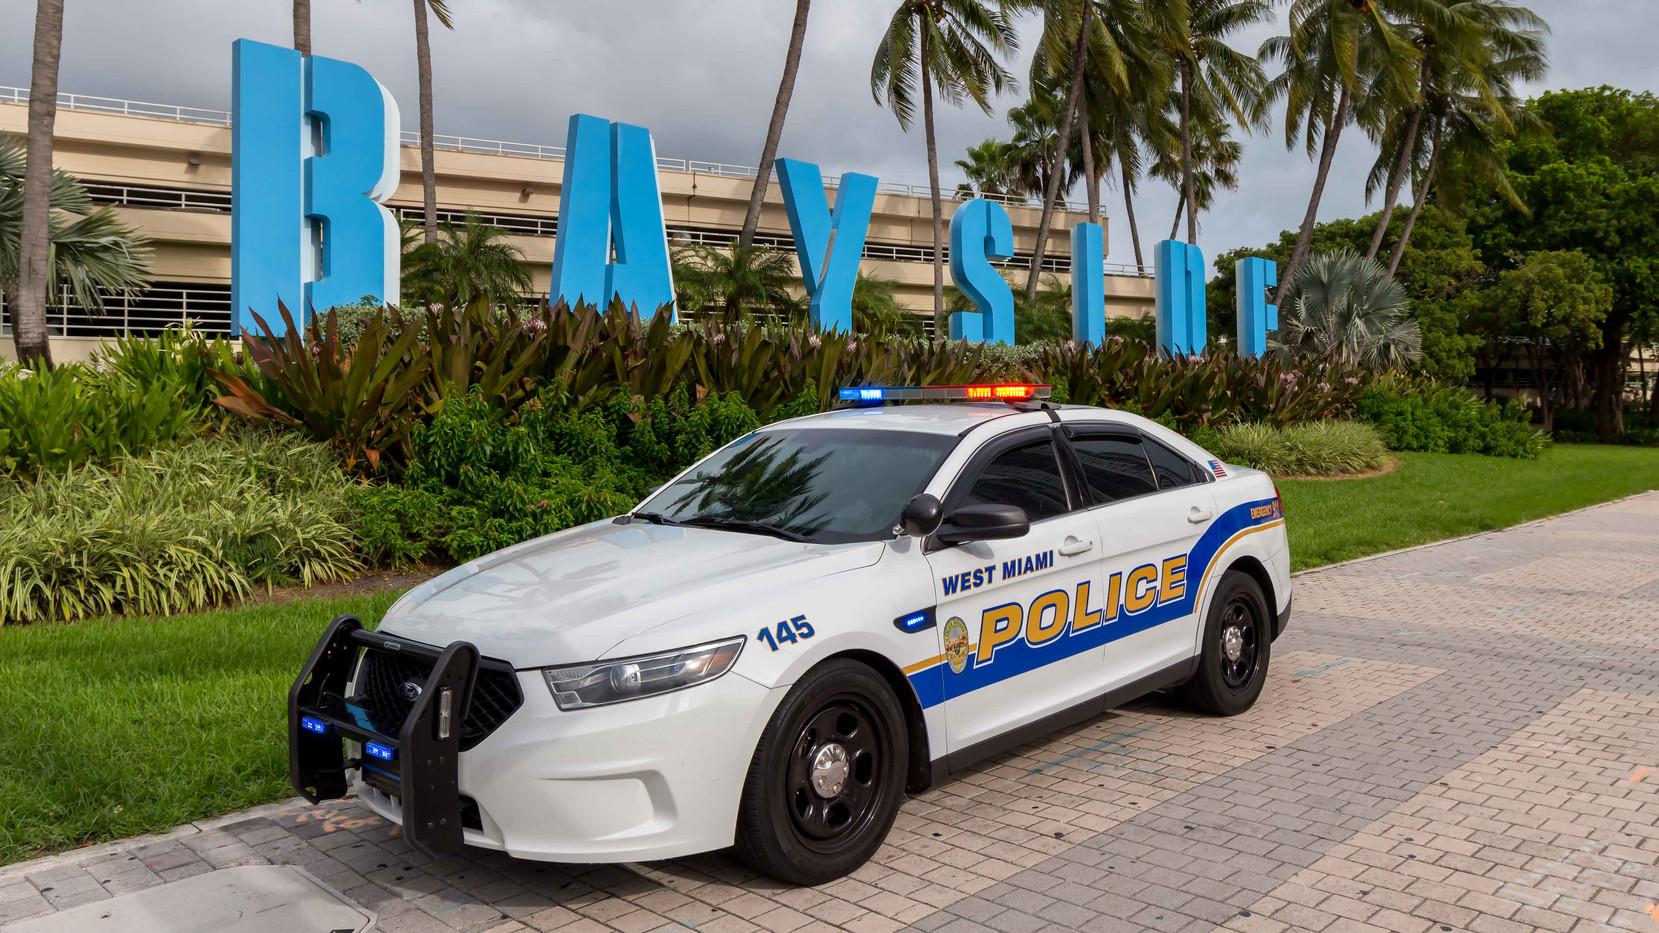 West Miami Police Department